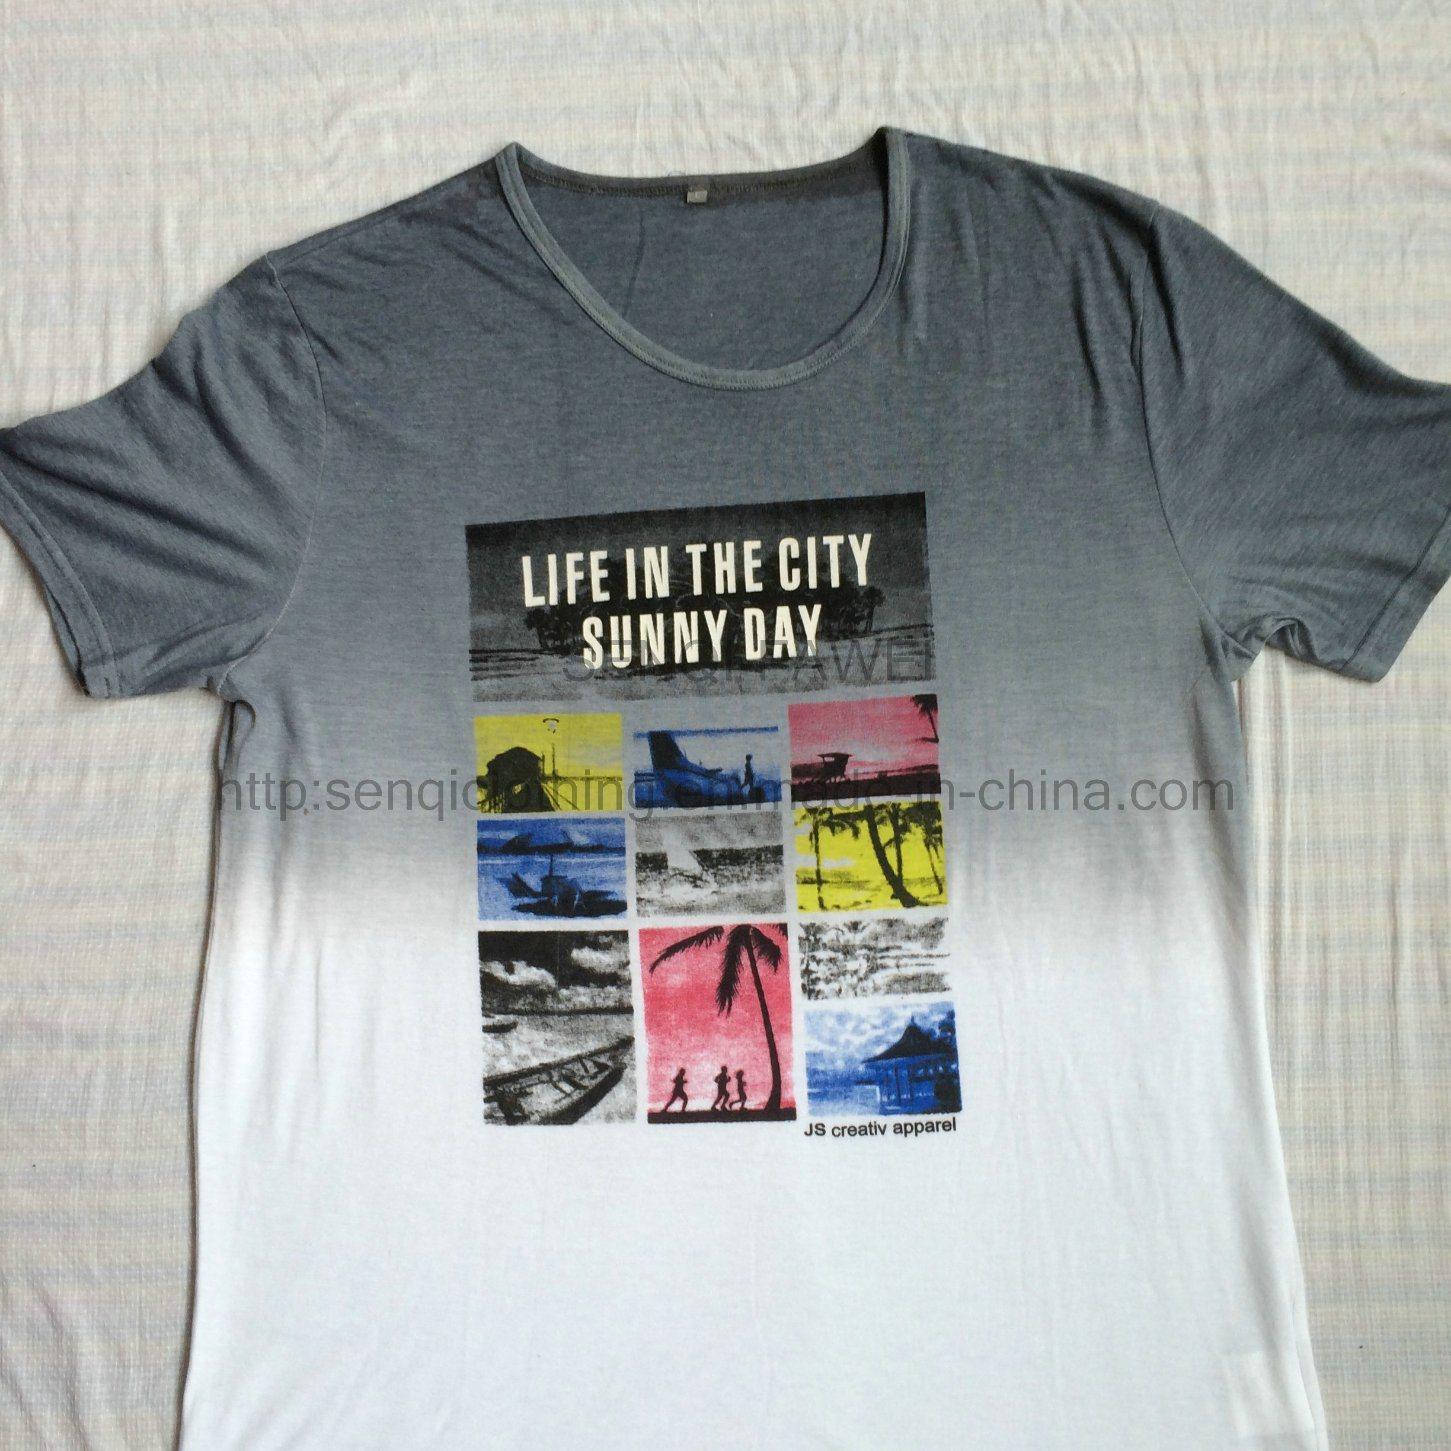 Summer White DIP Dye T-Shirt in Man Sport Knitwear Clothes Fw-8677